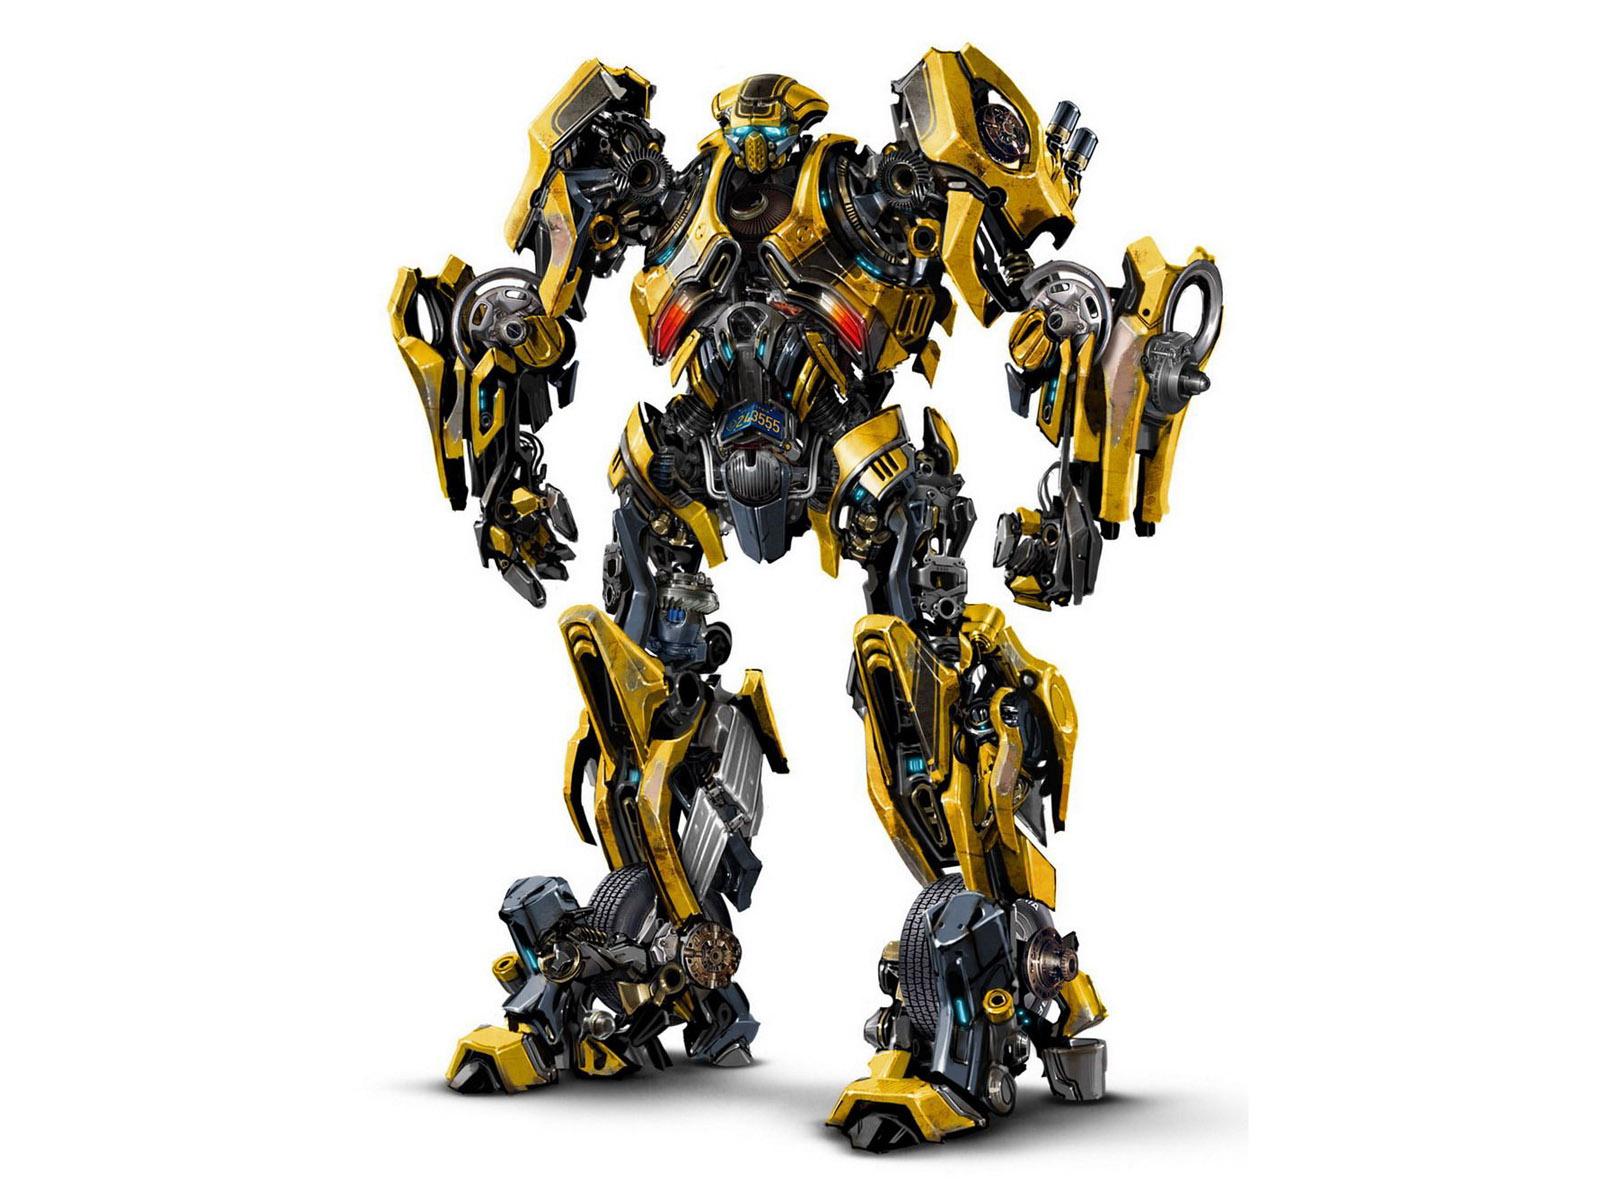 Transformers Bumblebee 1600x1200